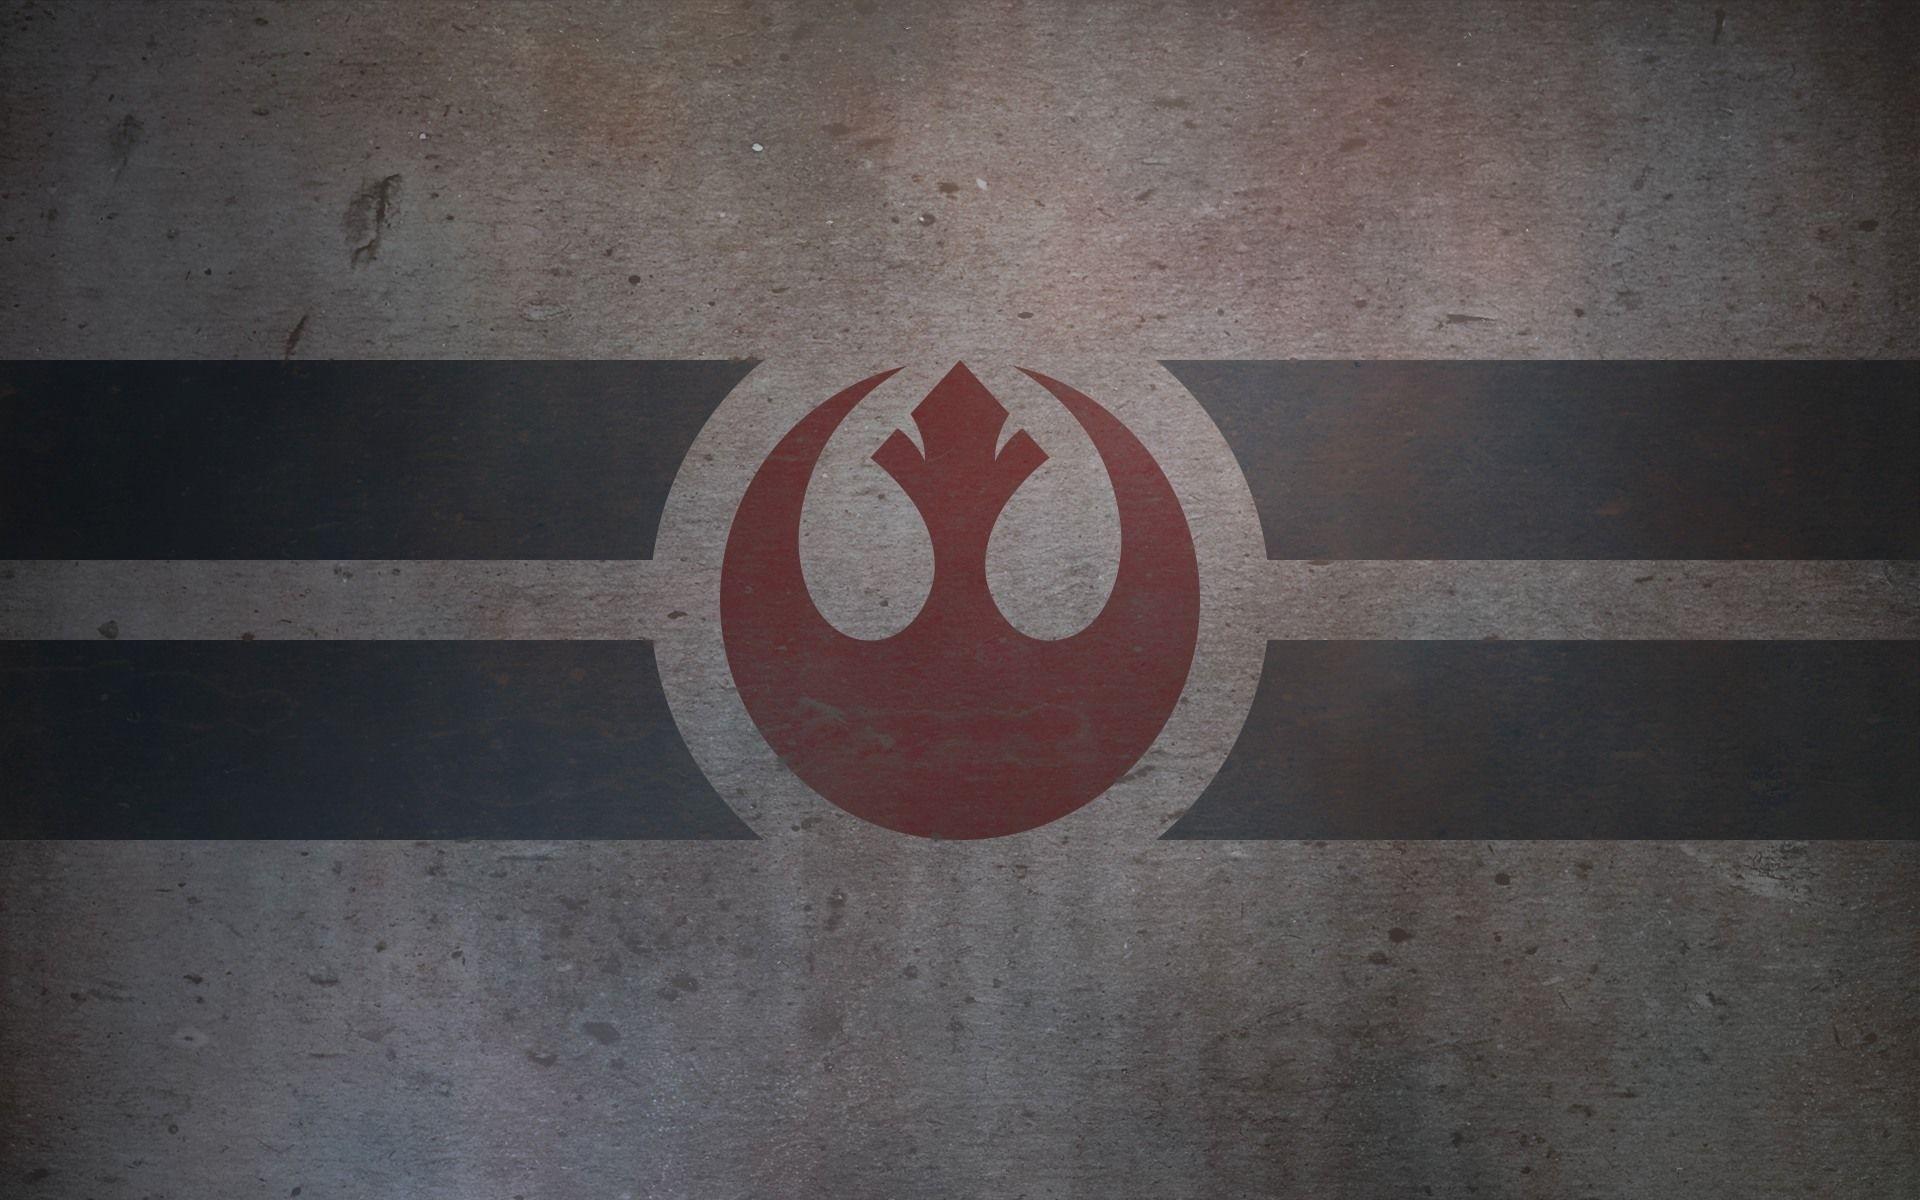 star wars rebels   star wars rebellion logo wallpaper   comics